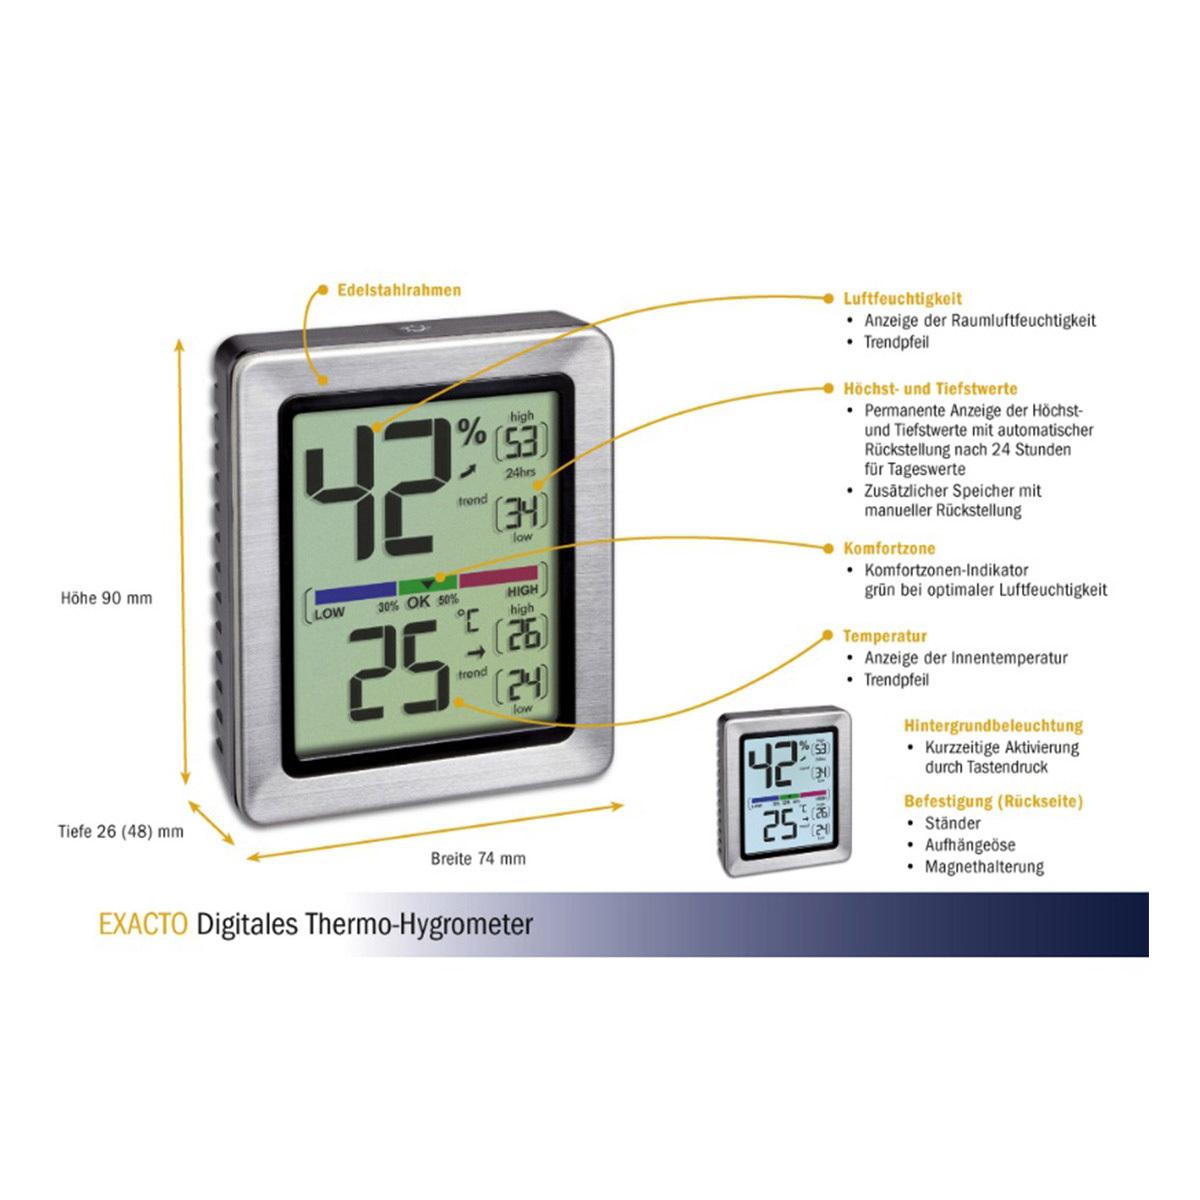 30-5047-54-digitales-thermo-hygrometer-exacto-abmessungen-1200x1200px.jpg